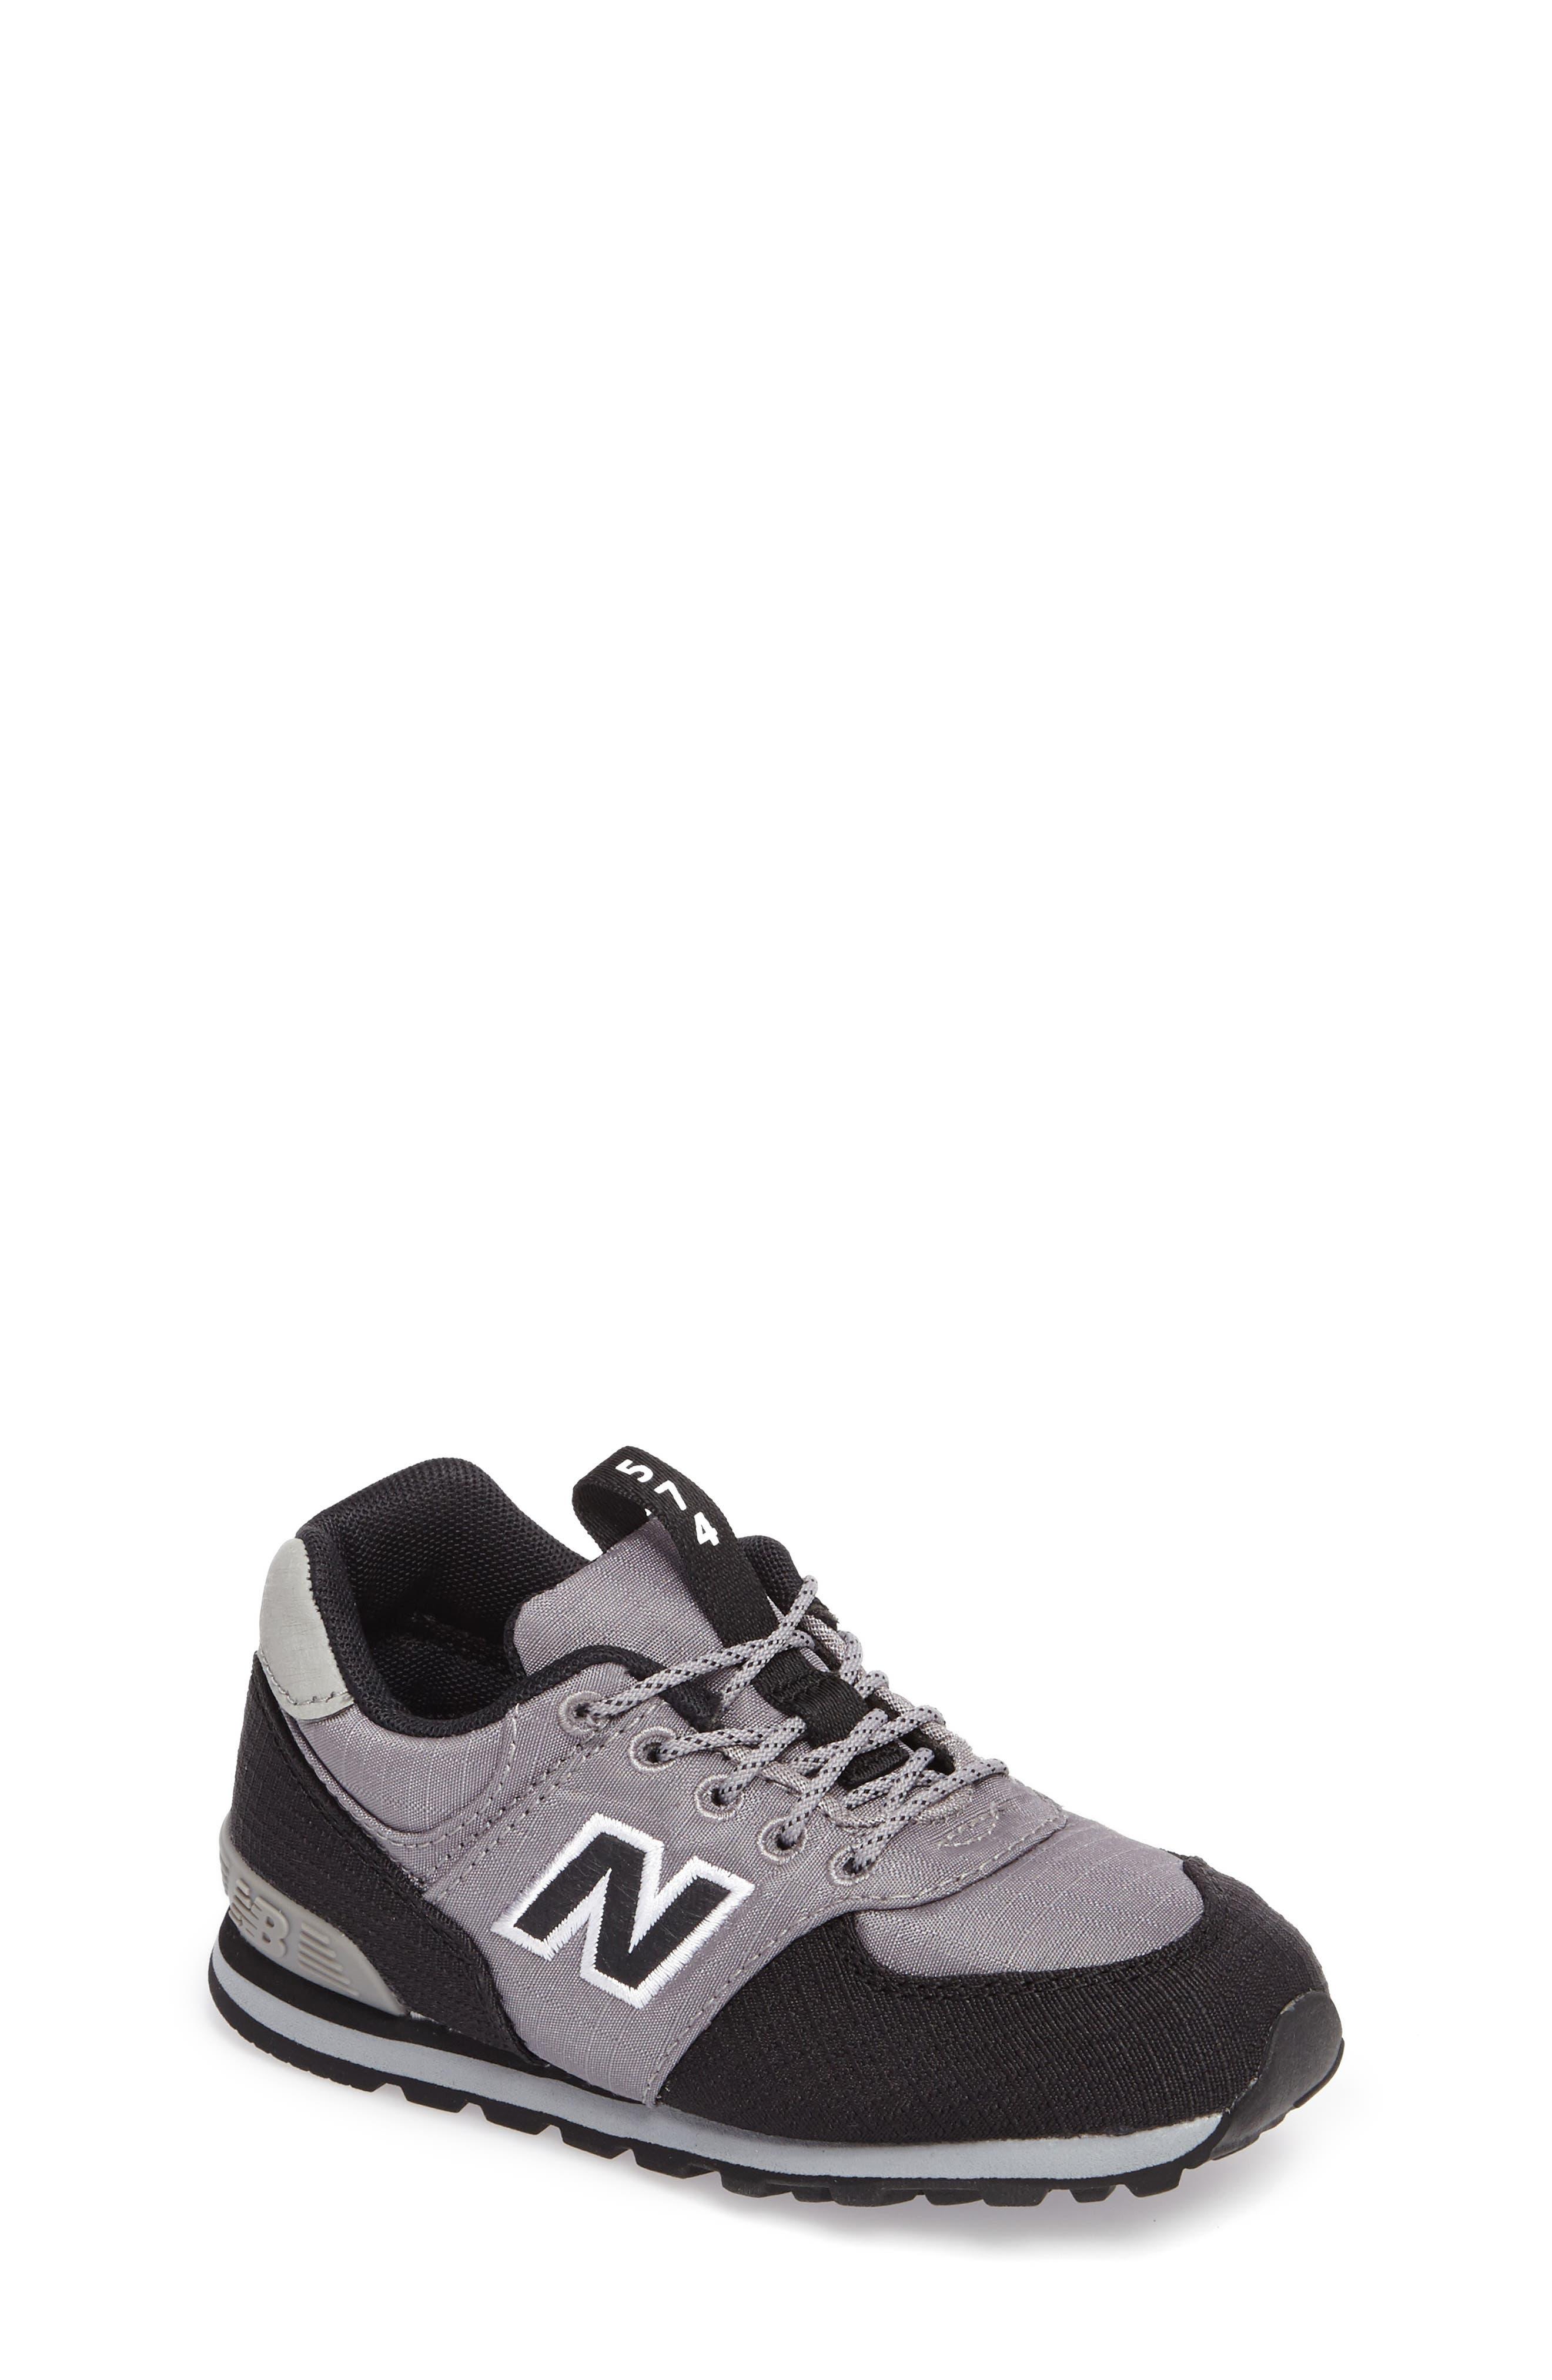 Alternate Image 1 Selected - New Balance 990 Sneaker (Baby, Walker & Toddler)